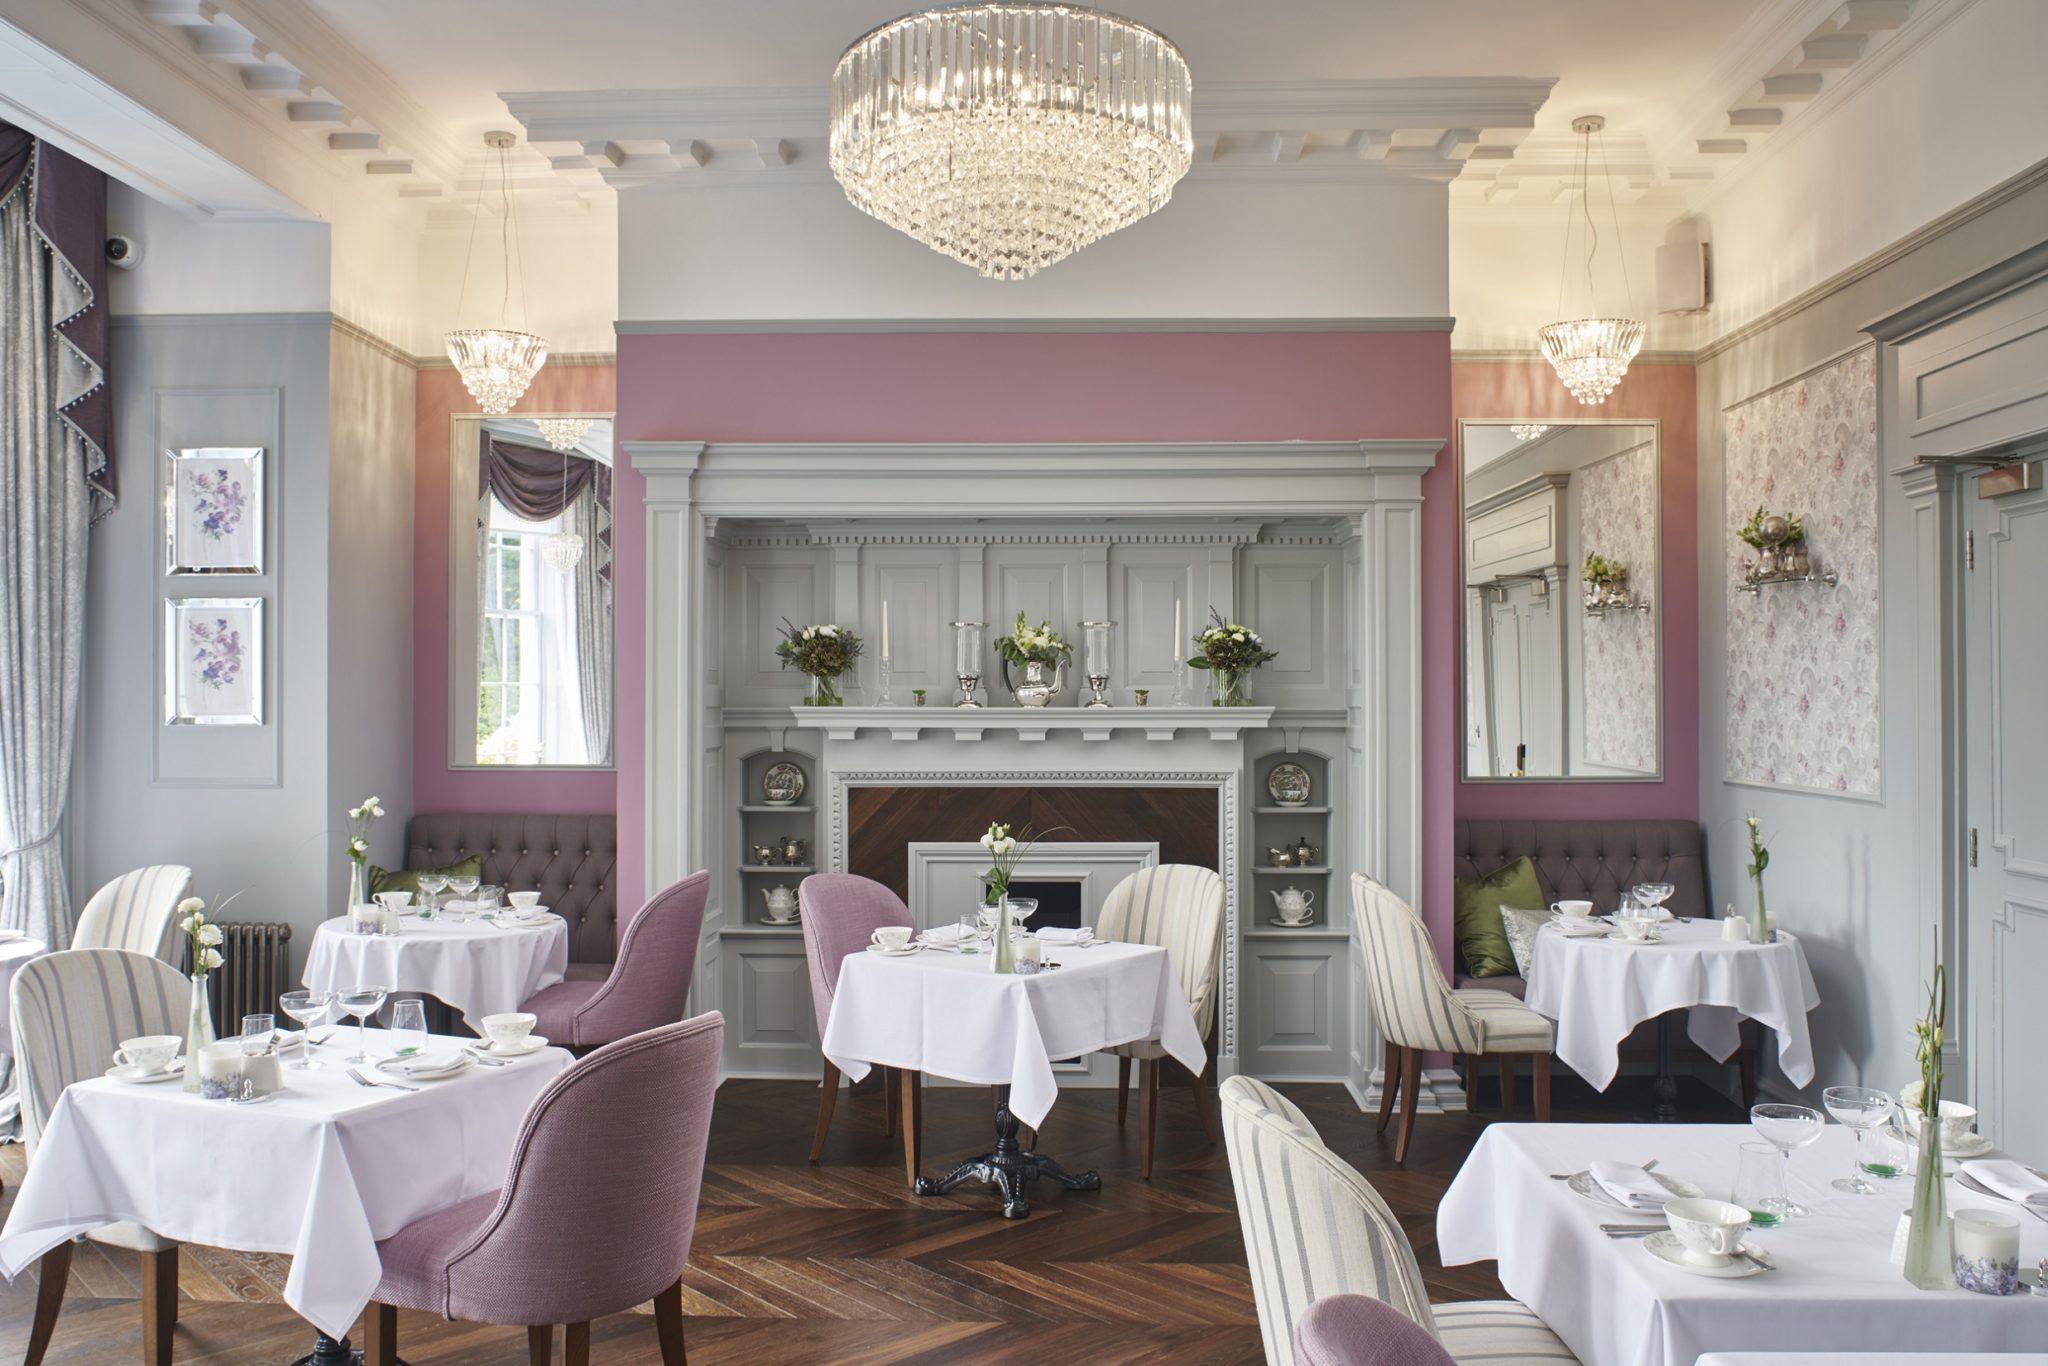 Laura Ashley The Tea Room at Burnham Beeches Hotel